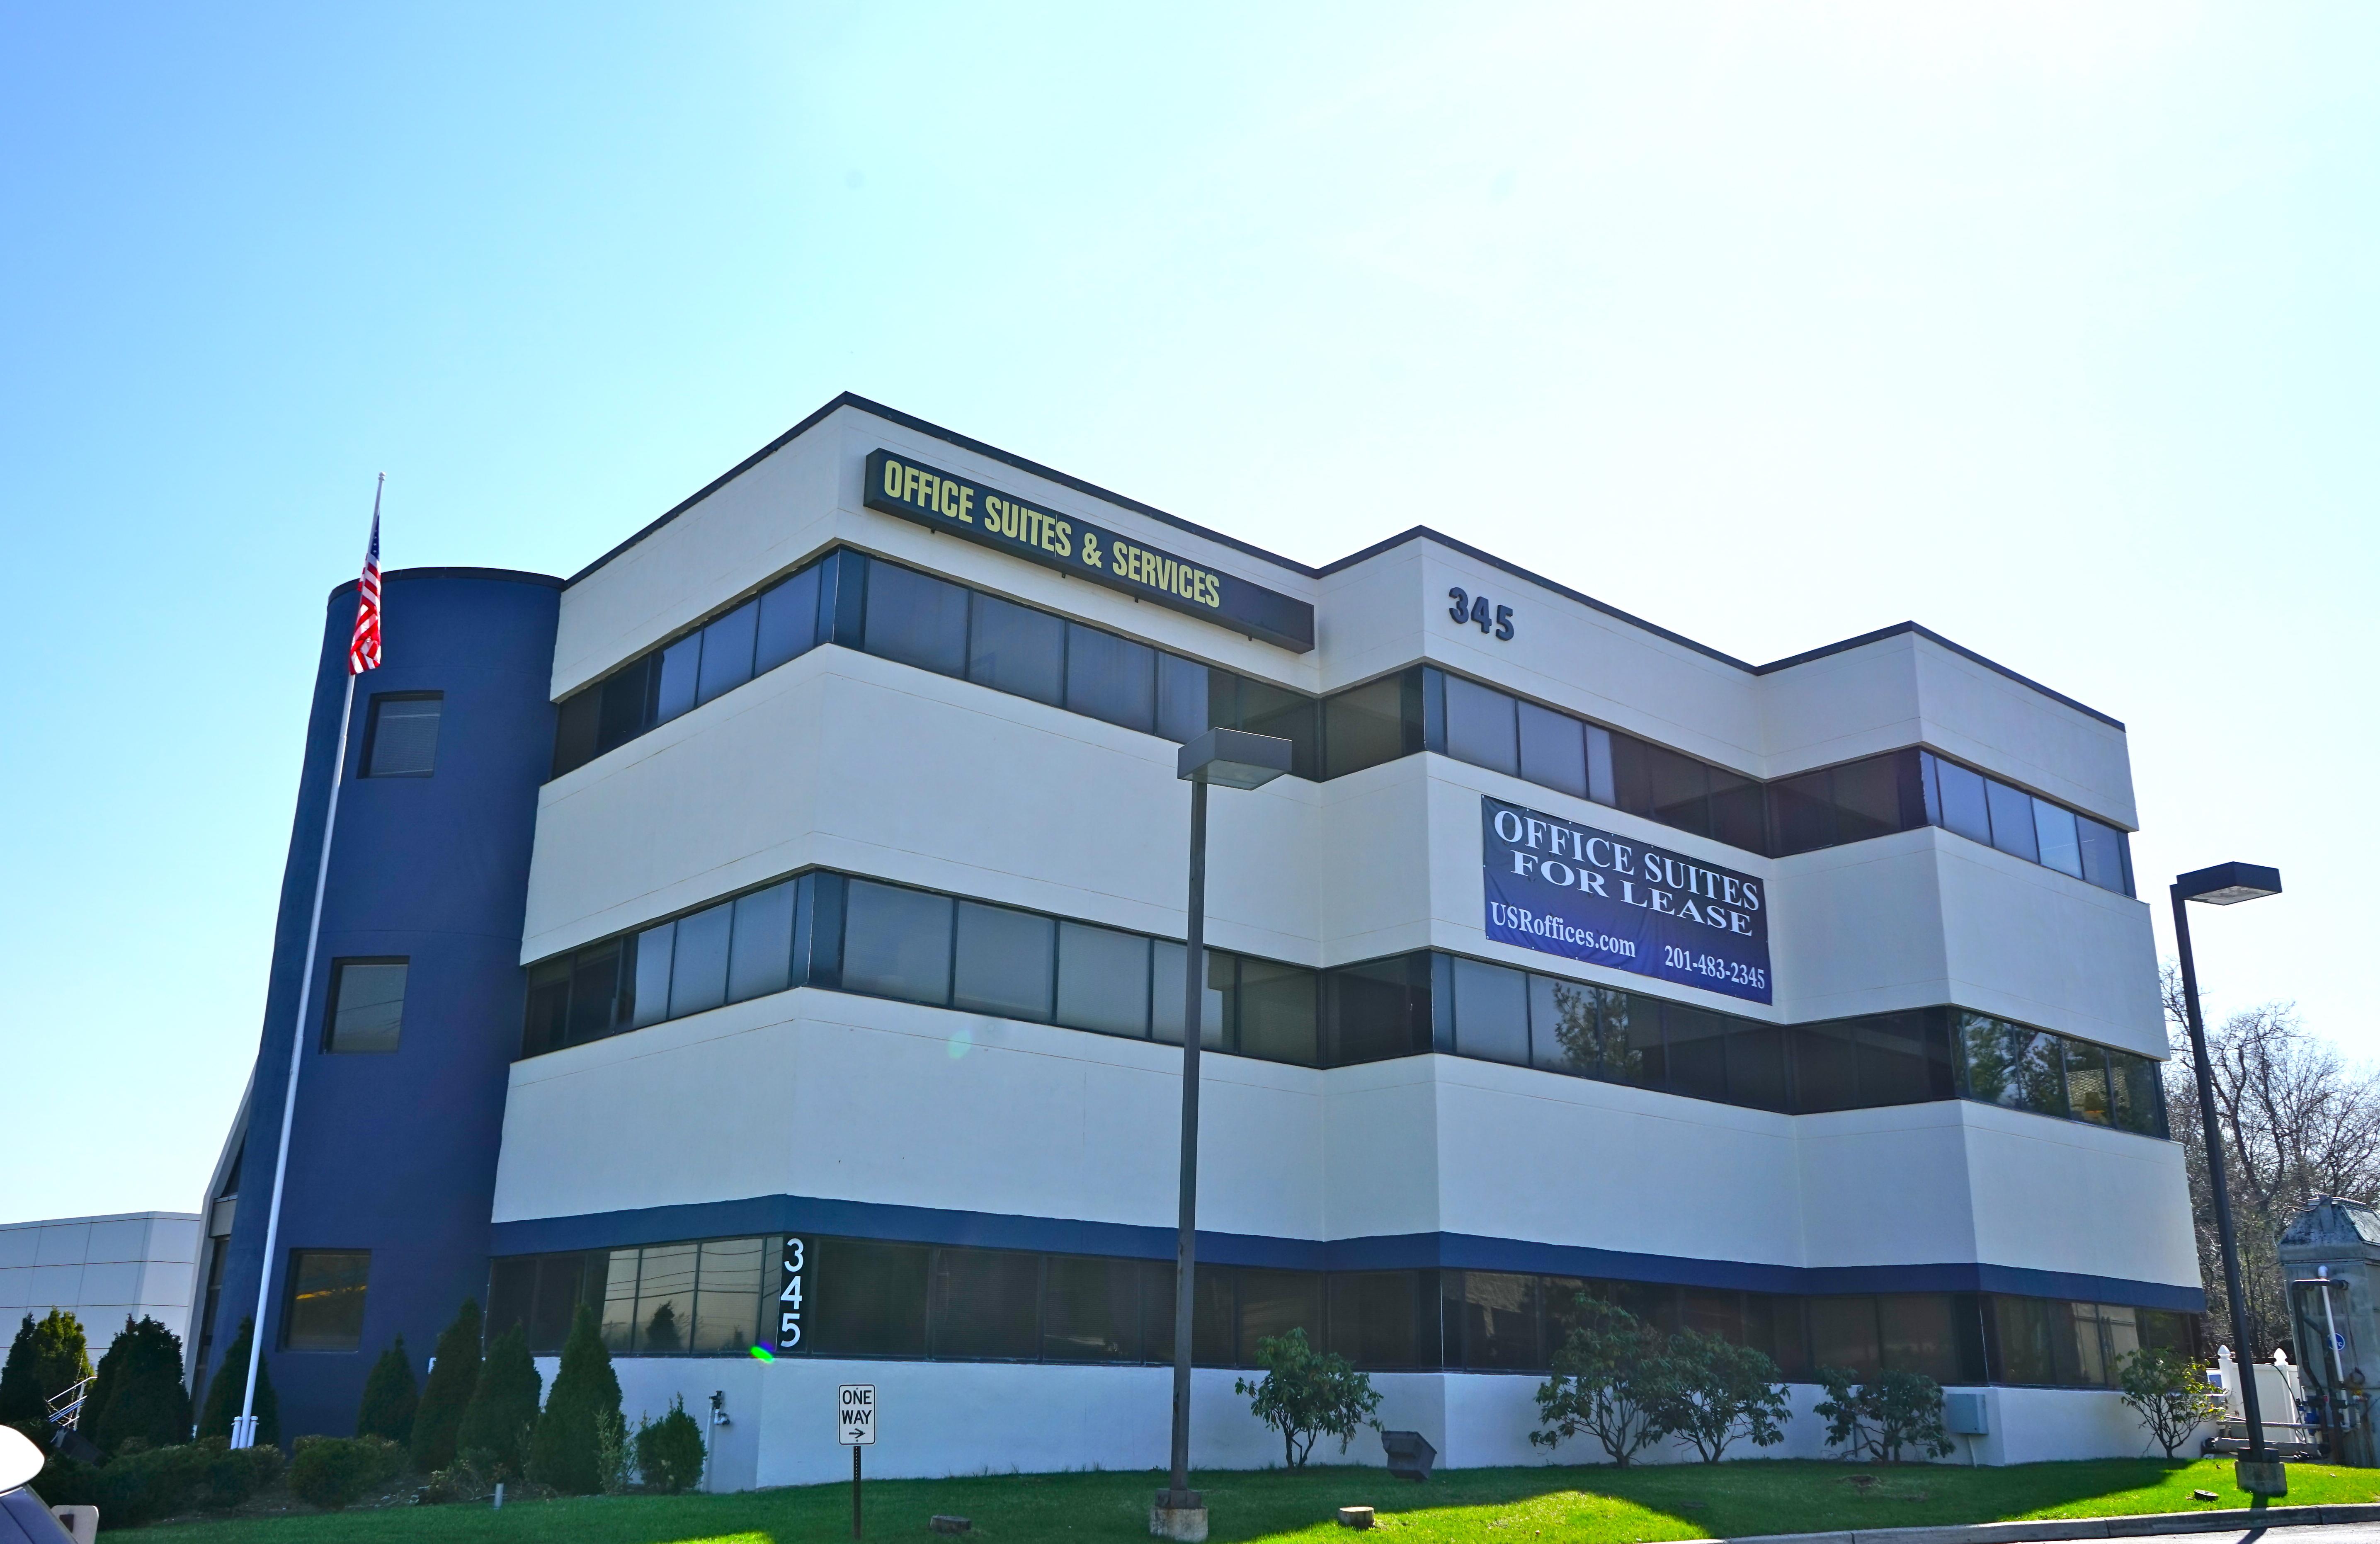 Upper Saddle River Offices